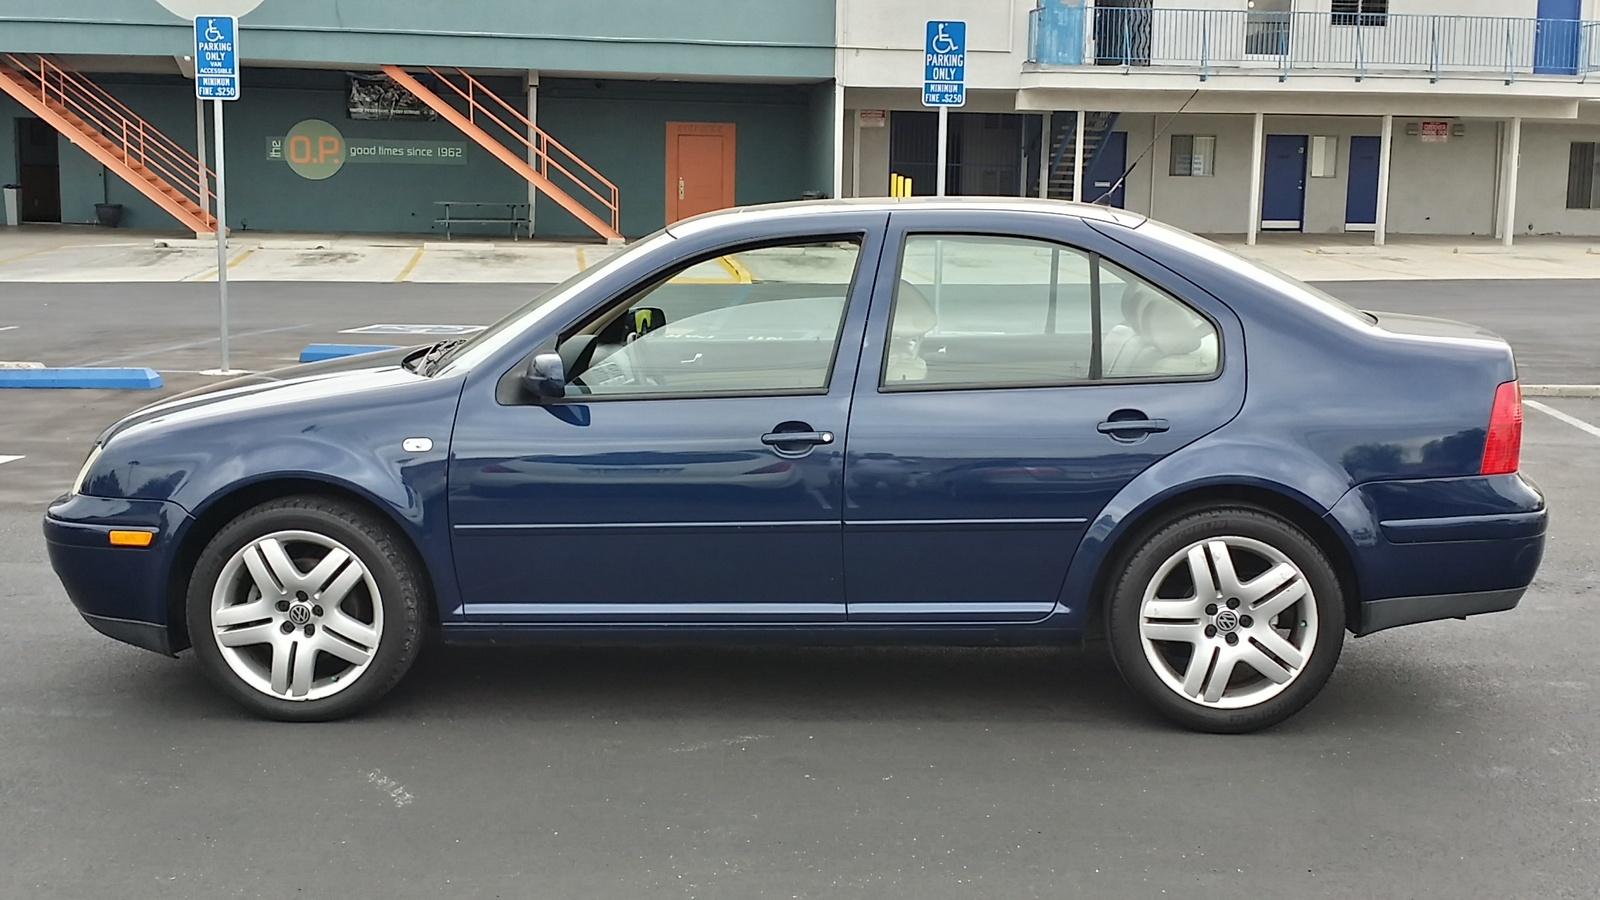 Volkswagen Jetta 18 2001 Technical Specifications Interior And Sedan Exterior Photo